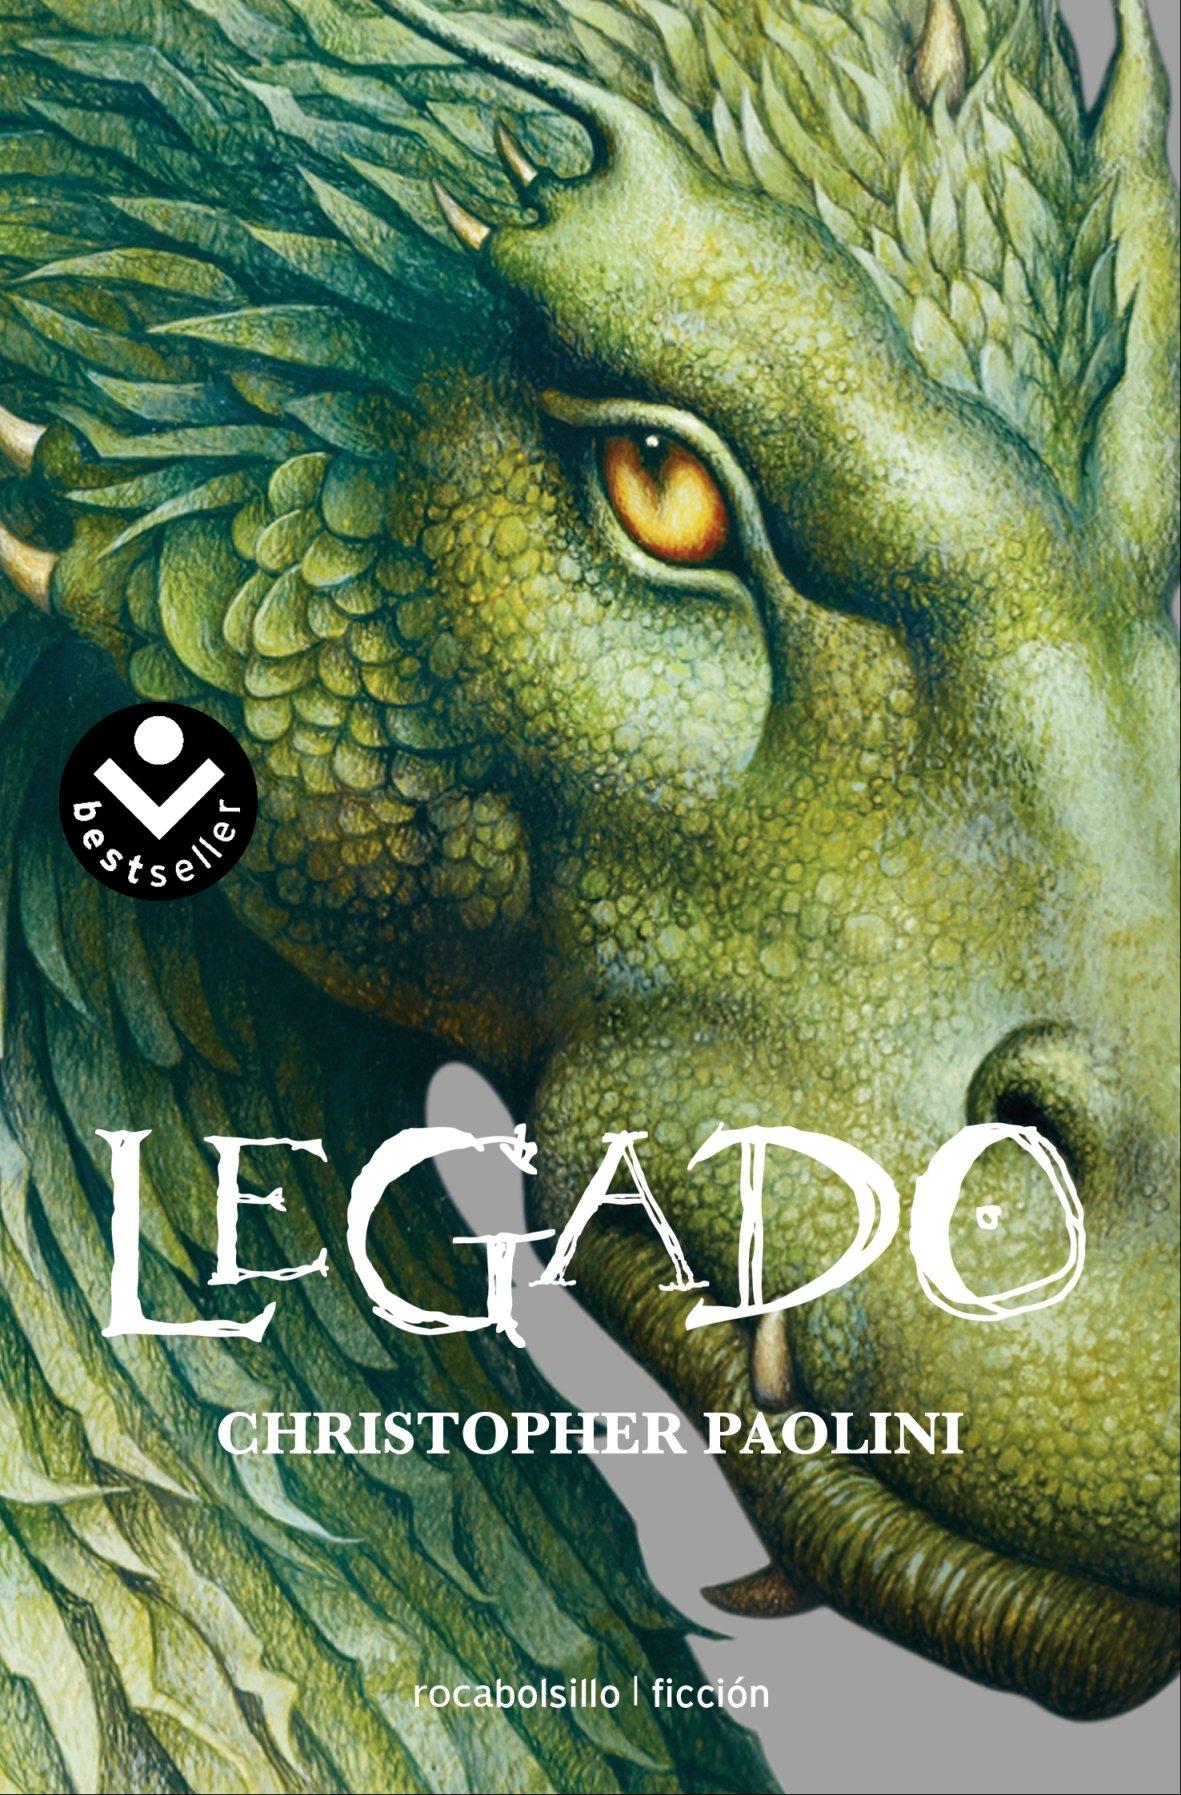 christopher paolini inheritance epub free download